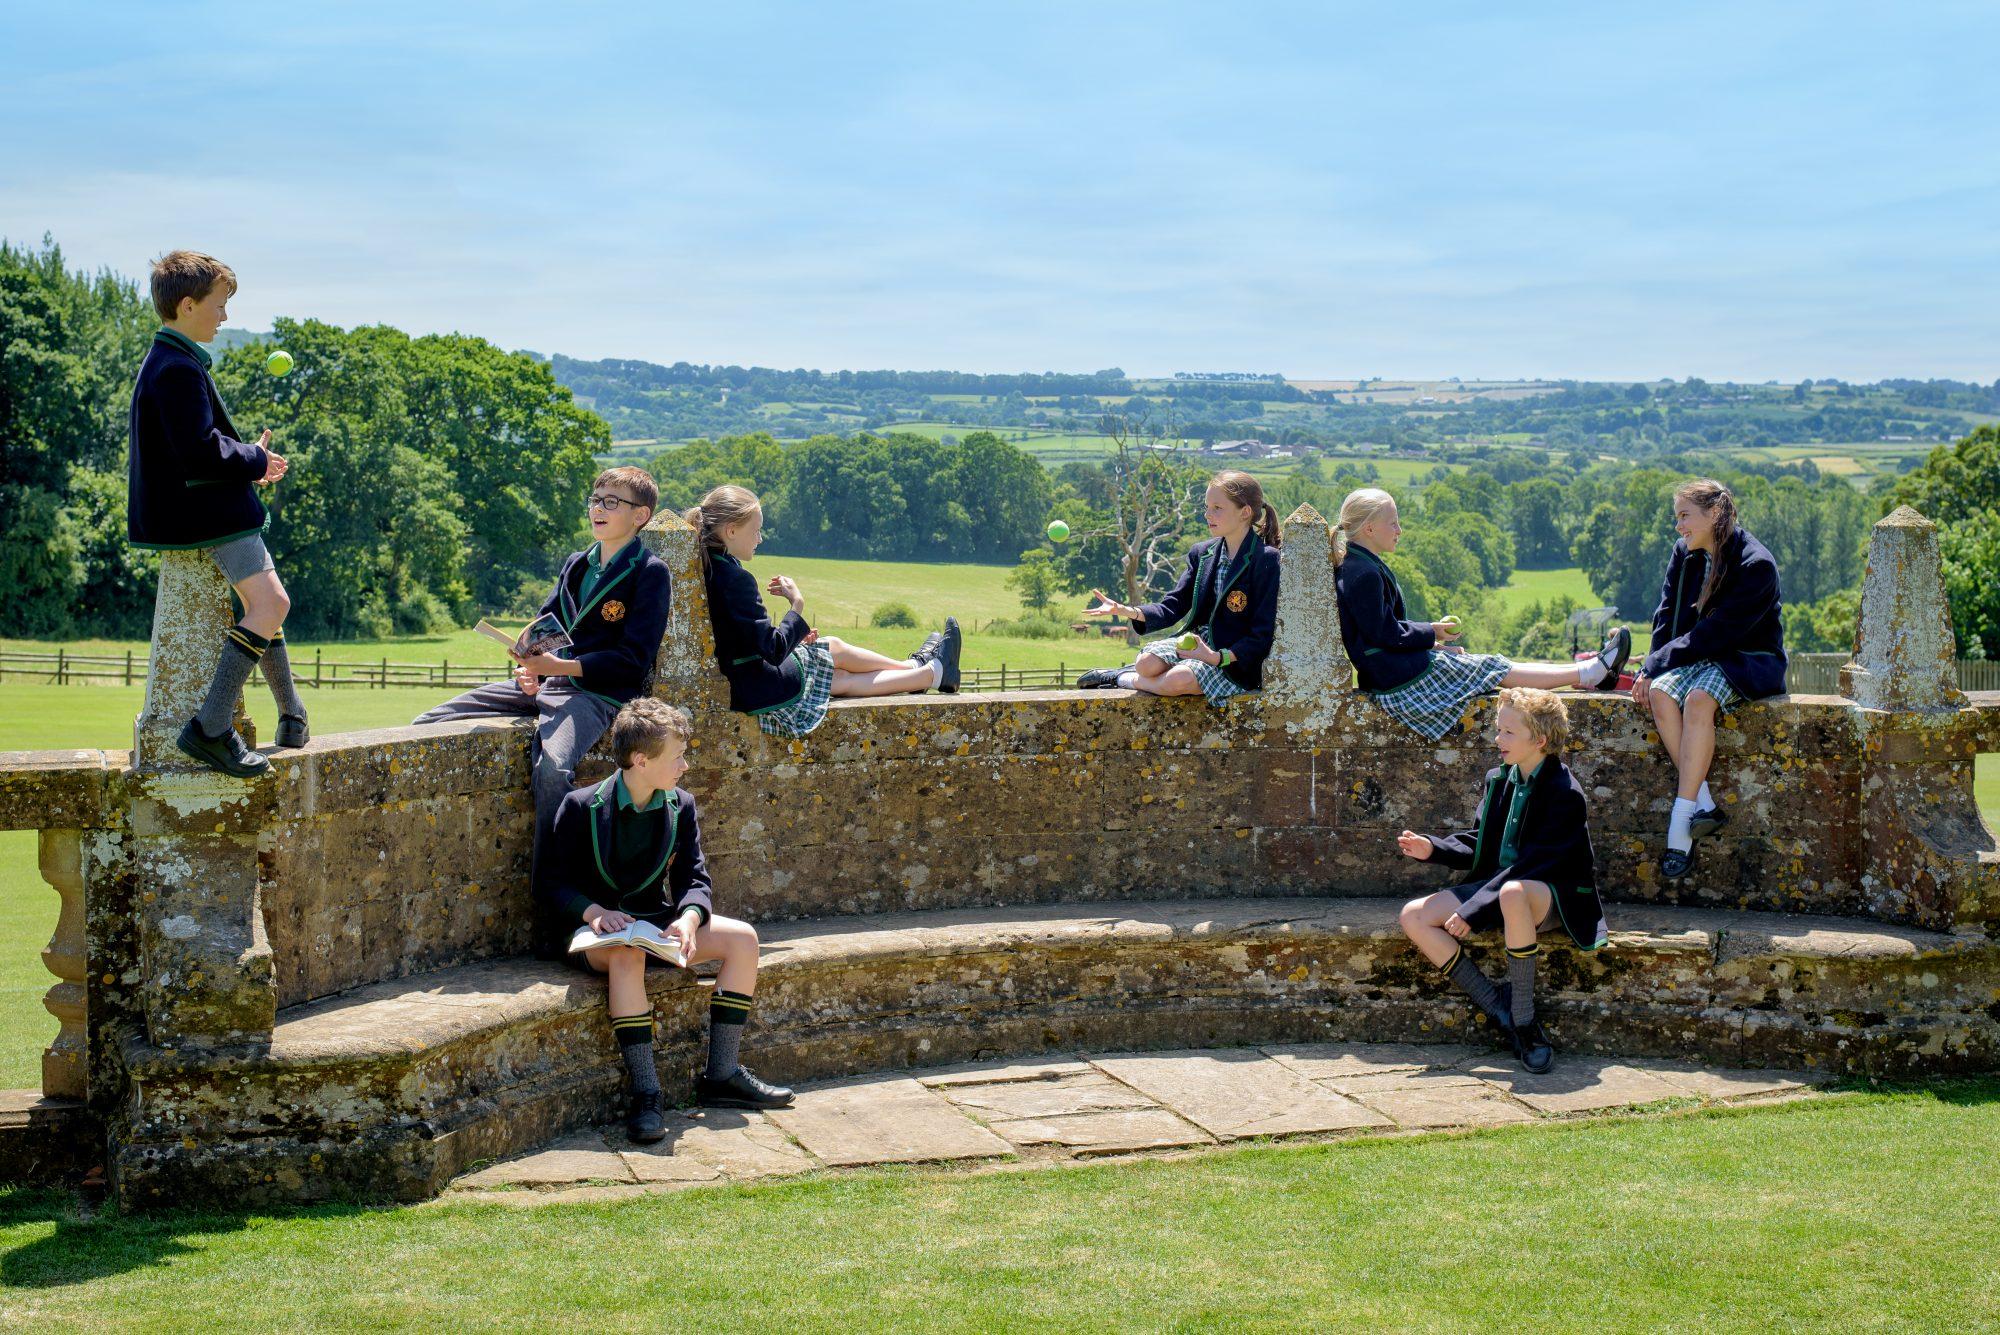 Scholarship Day at Perrott Hill Prep School in Somerset